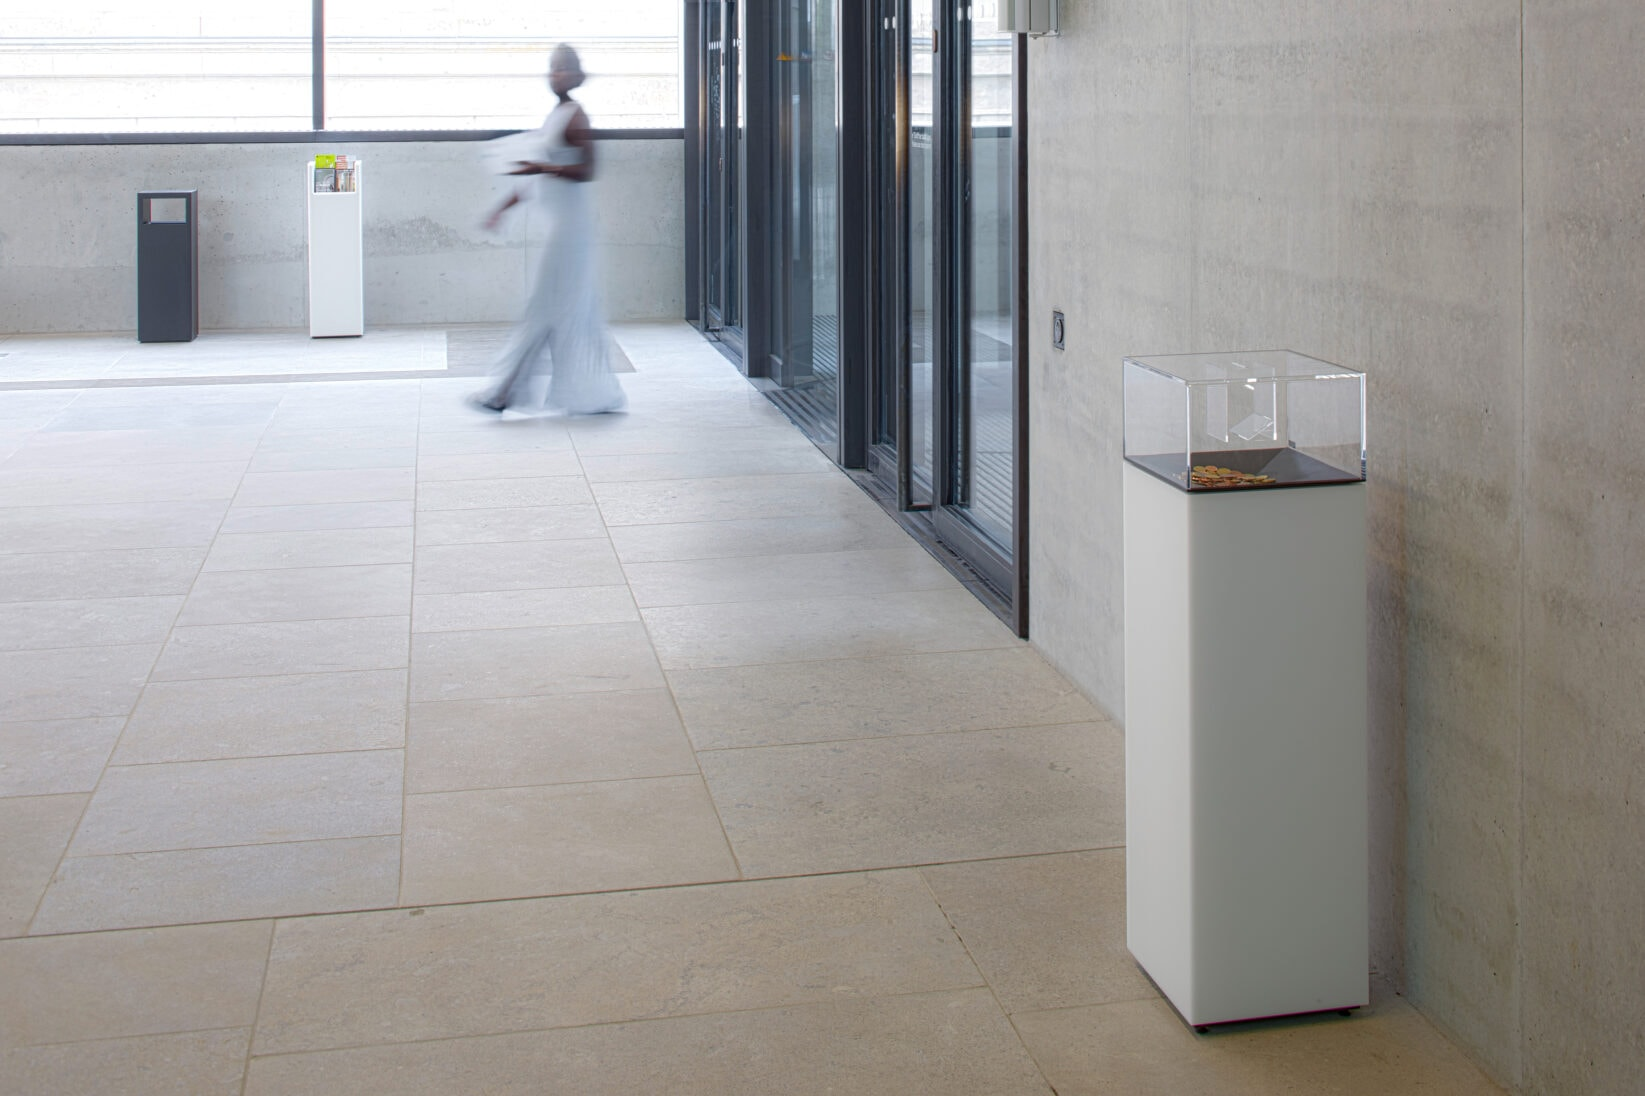 Museumsinsel Berlin James-Simon-Galerie Servicemöbel